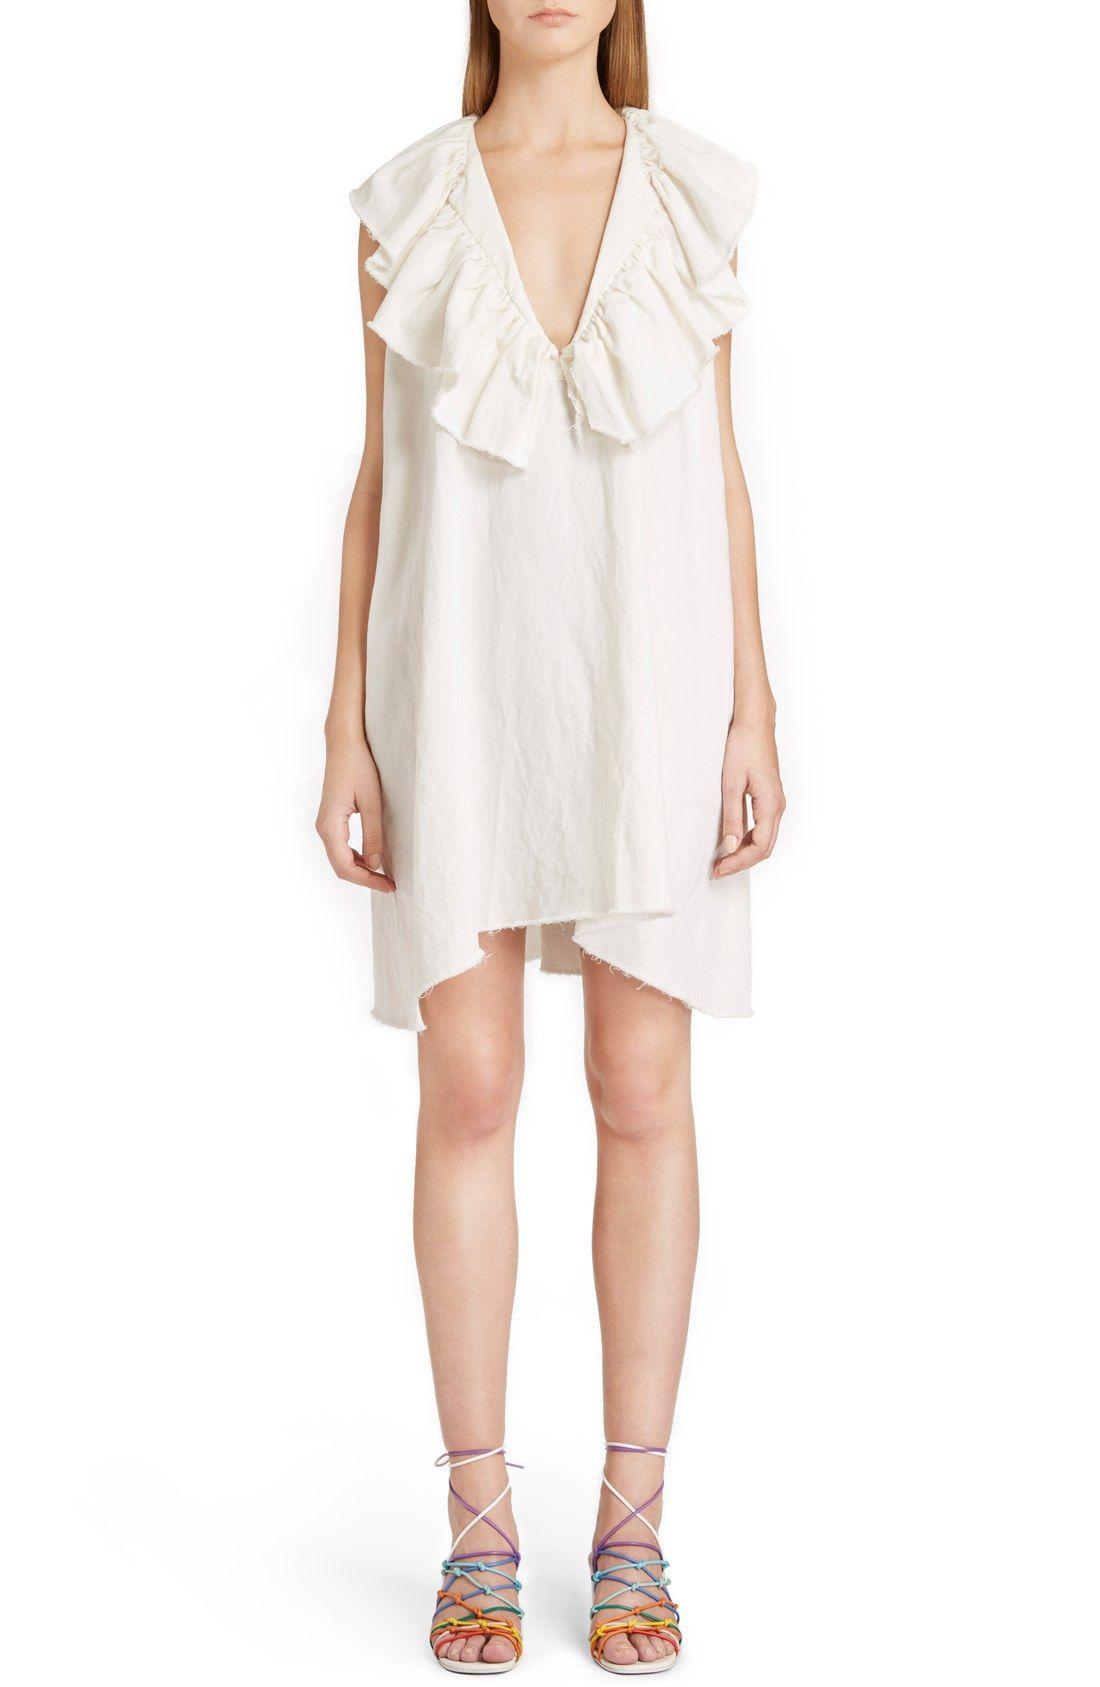 Chloe Ruffle V Neck Shift Dress Nordstrom Shift Dress Dresses Nordstrom Dresses [ 1687 x 1100 Pixel ]